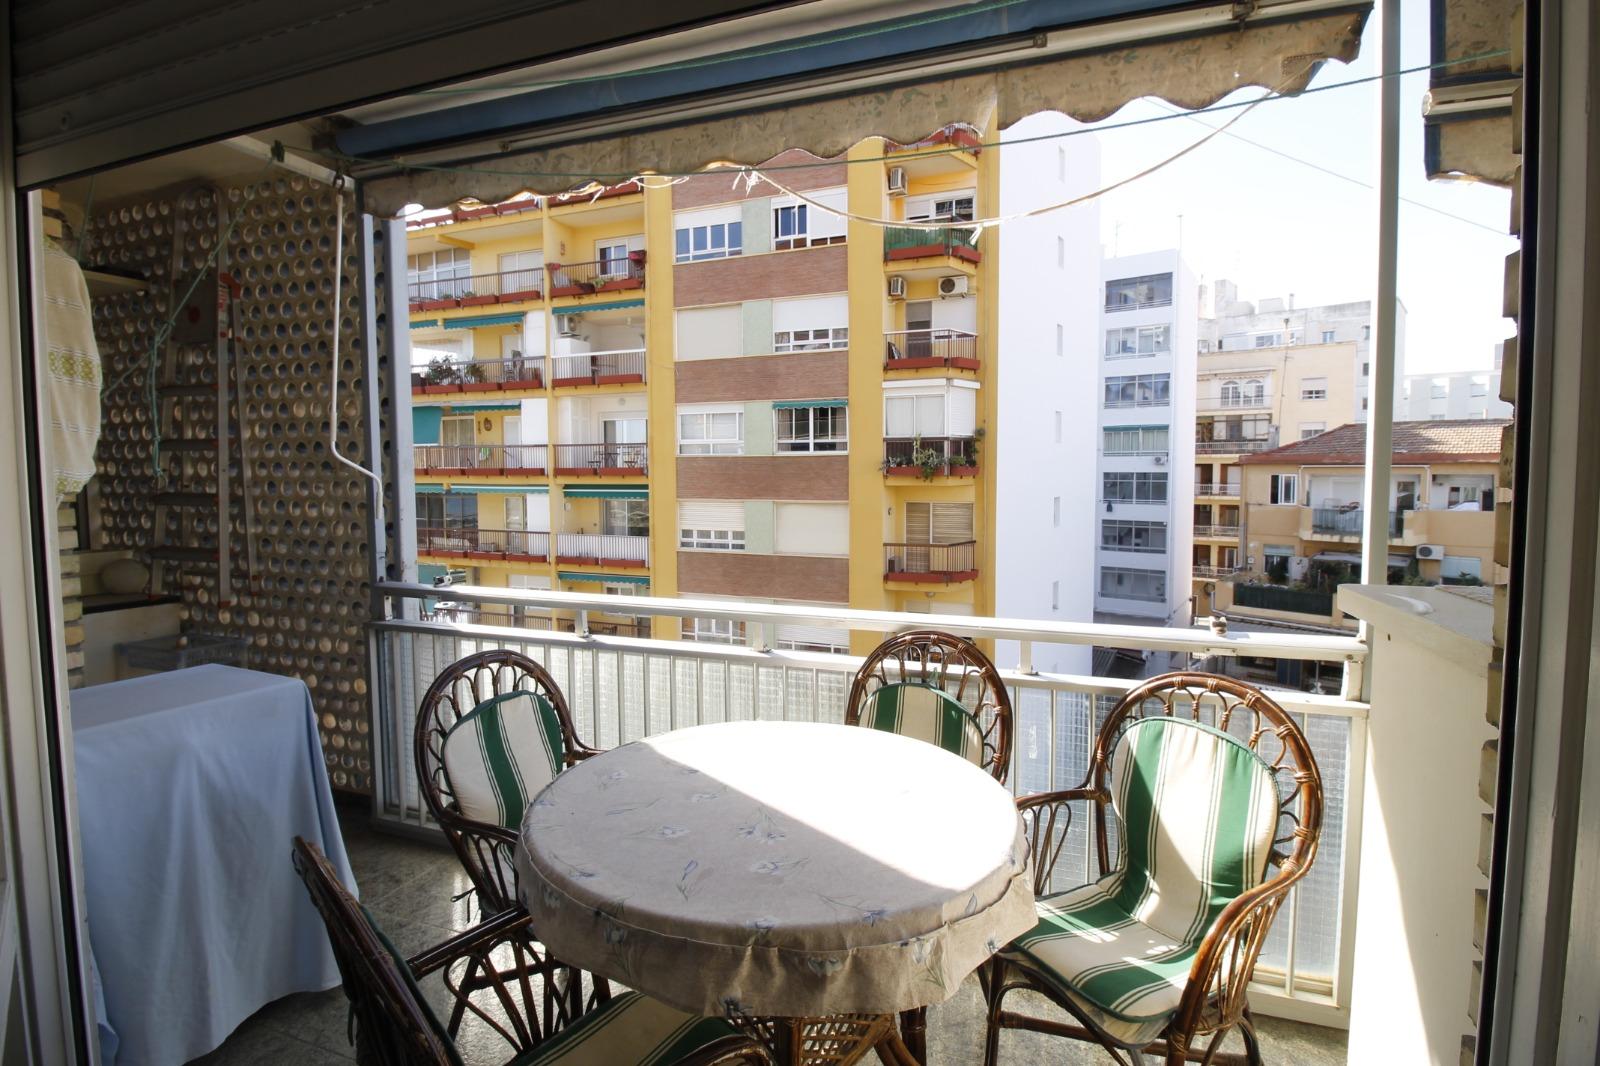 Mieszkanie calle Turina 3 Alicante p.4